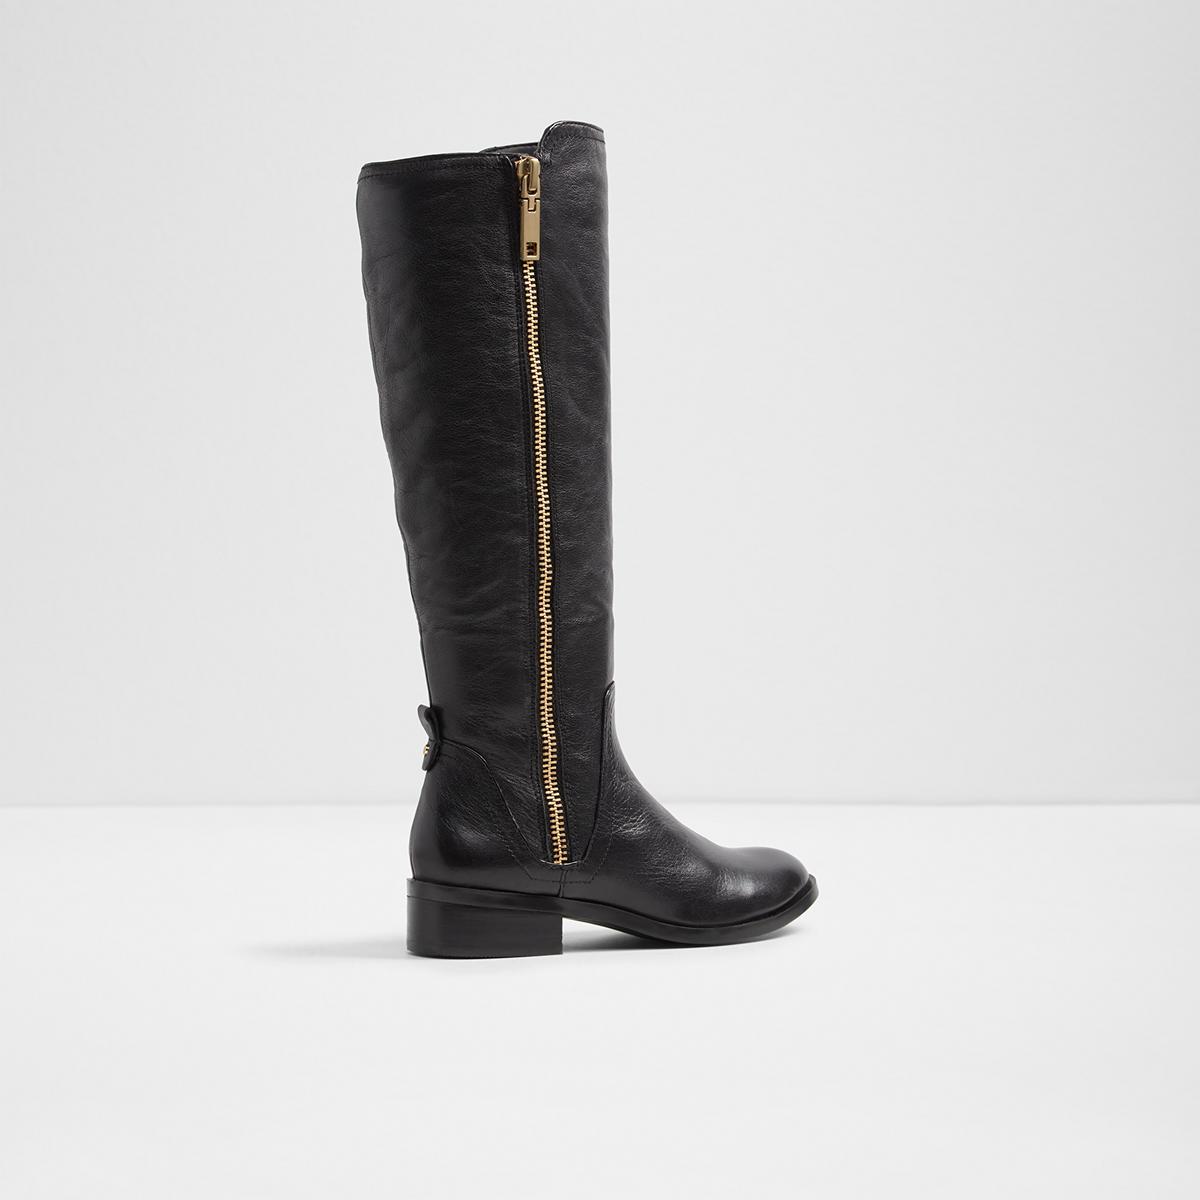 5755d0d3242 Mihaela Black Women s Boots